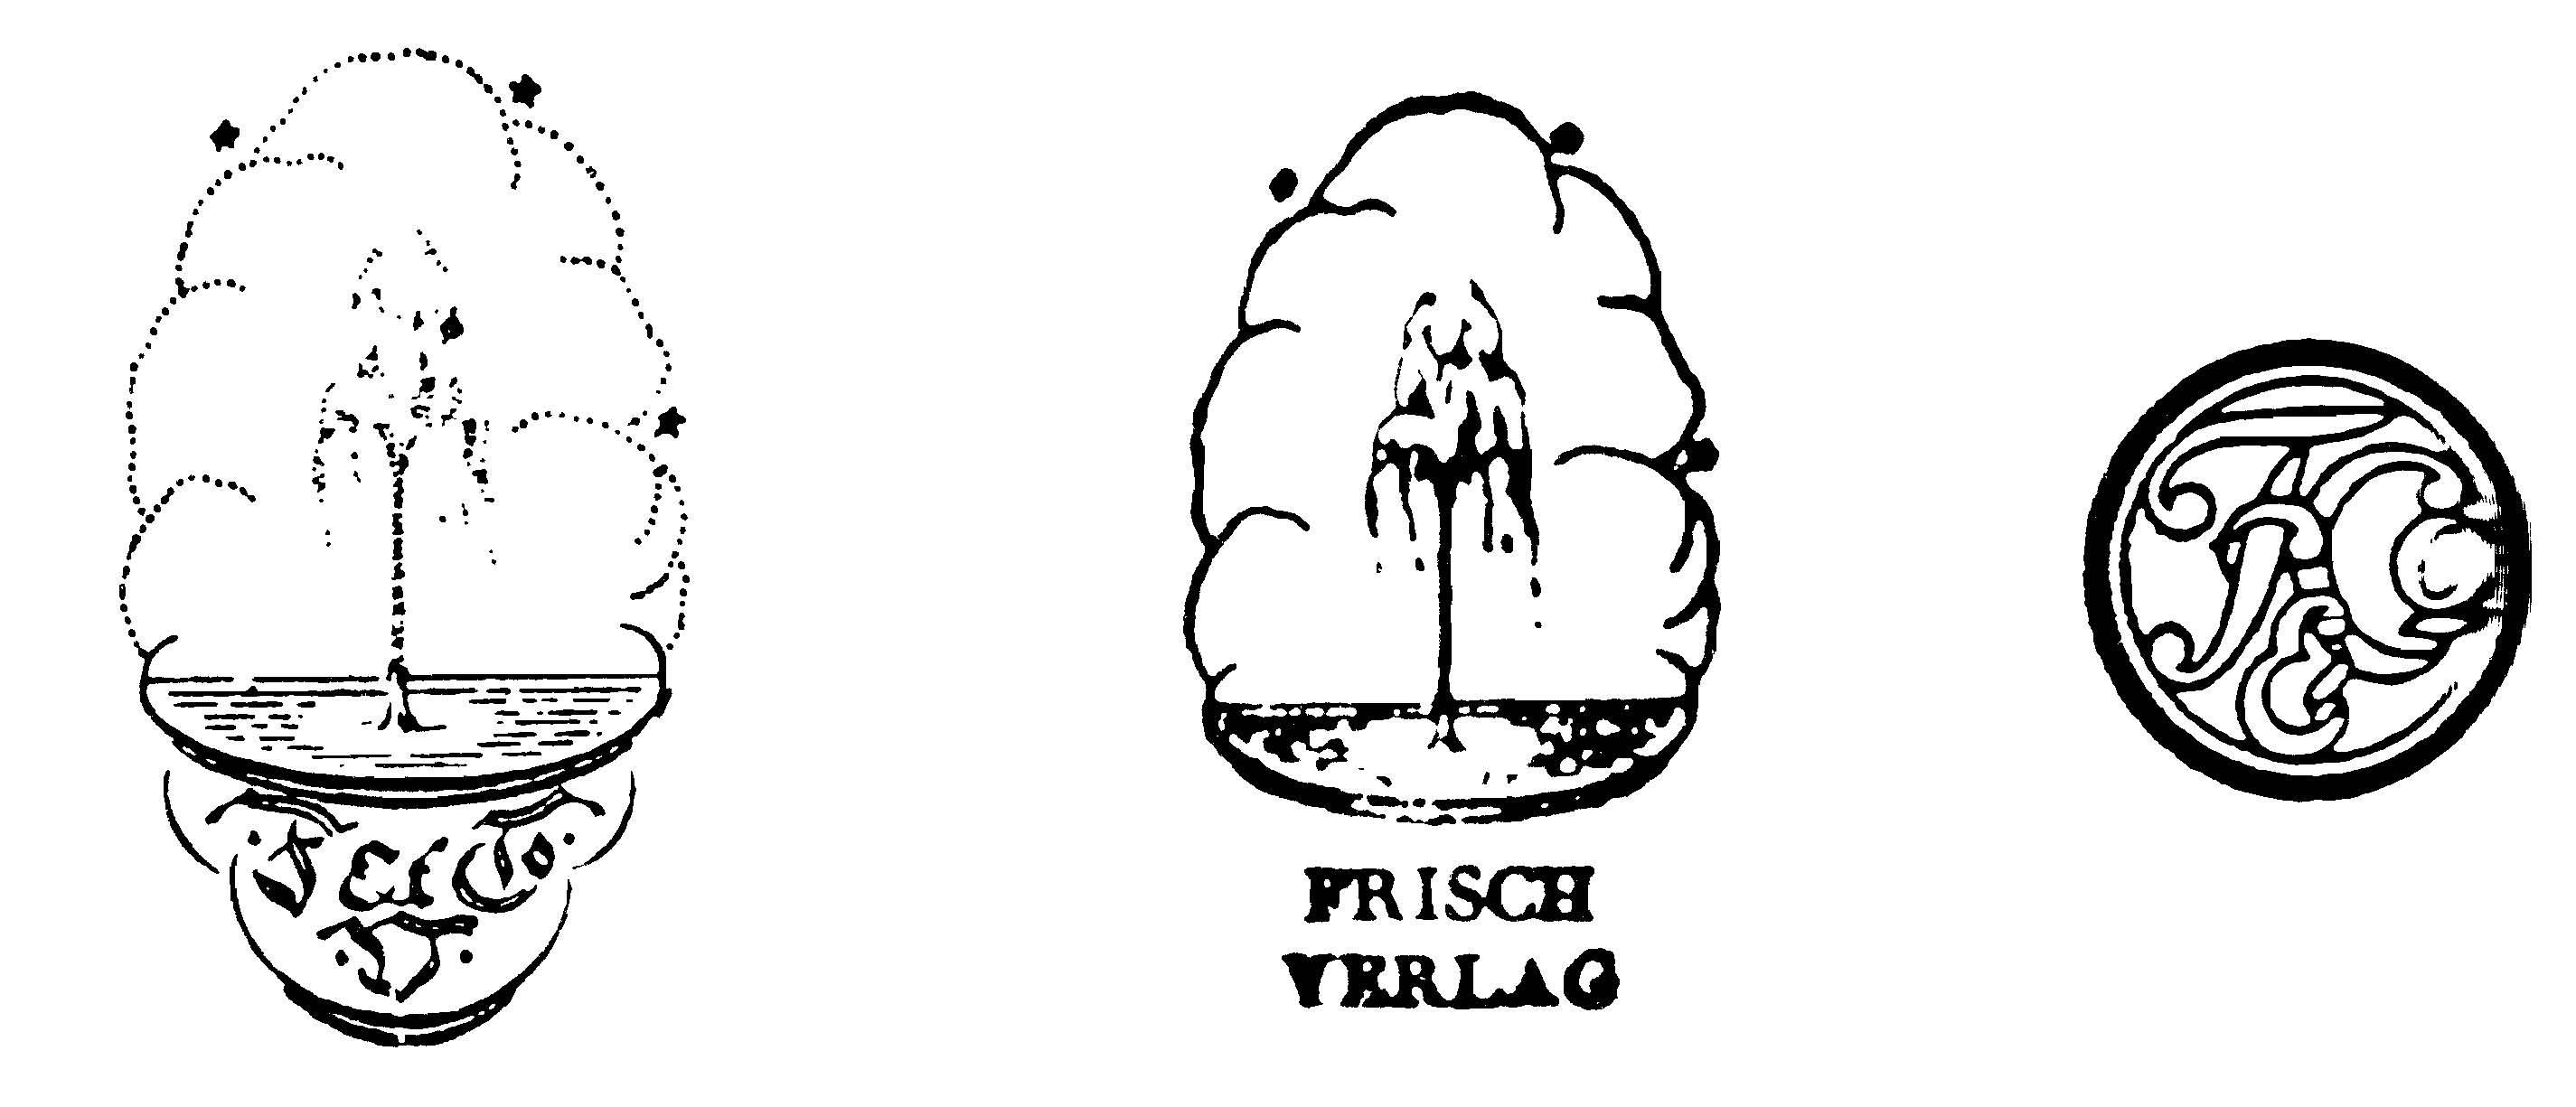 Frisch & Co Signets